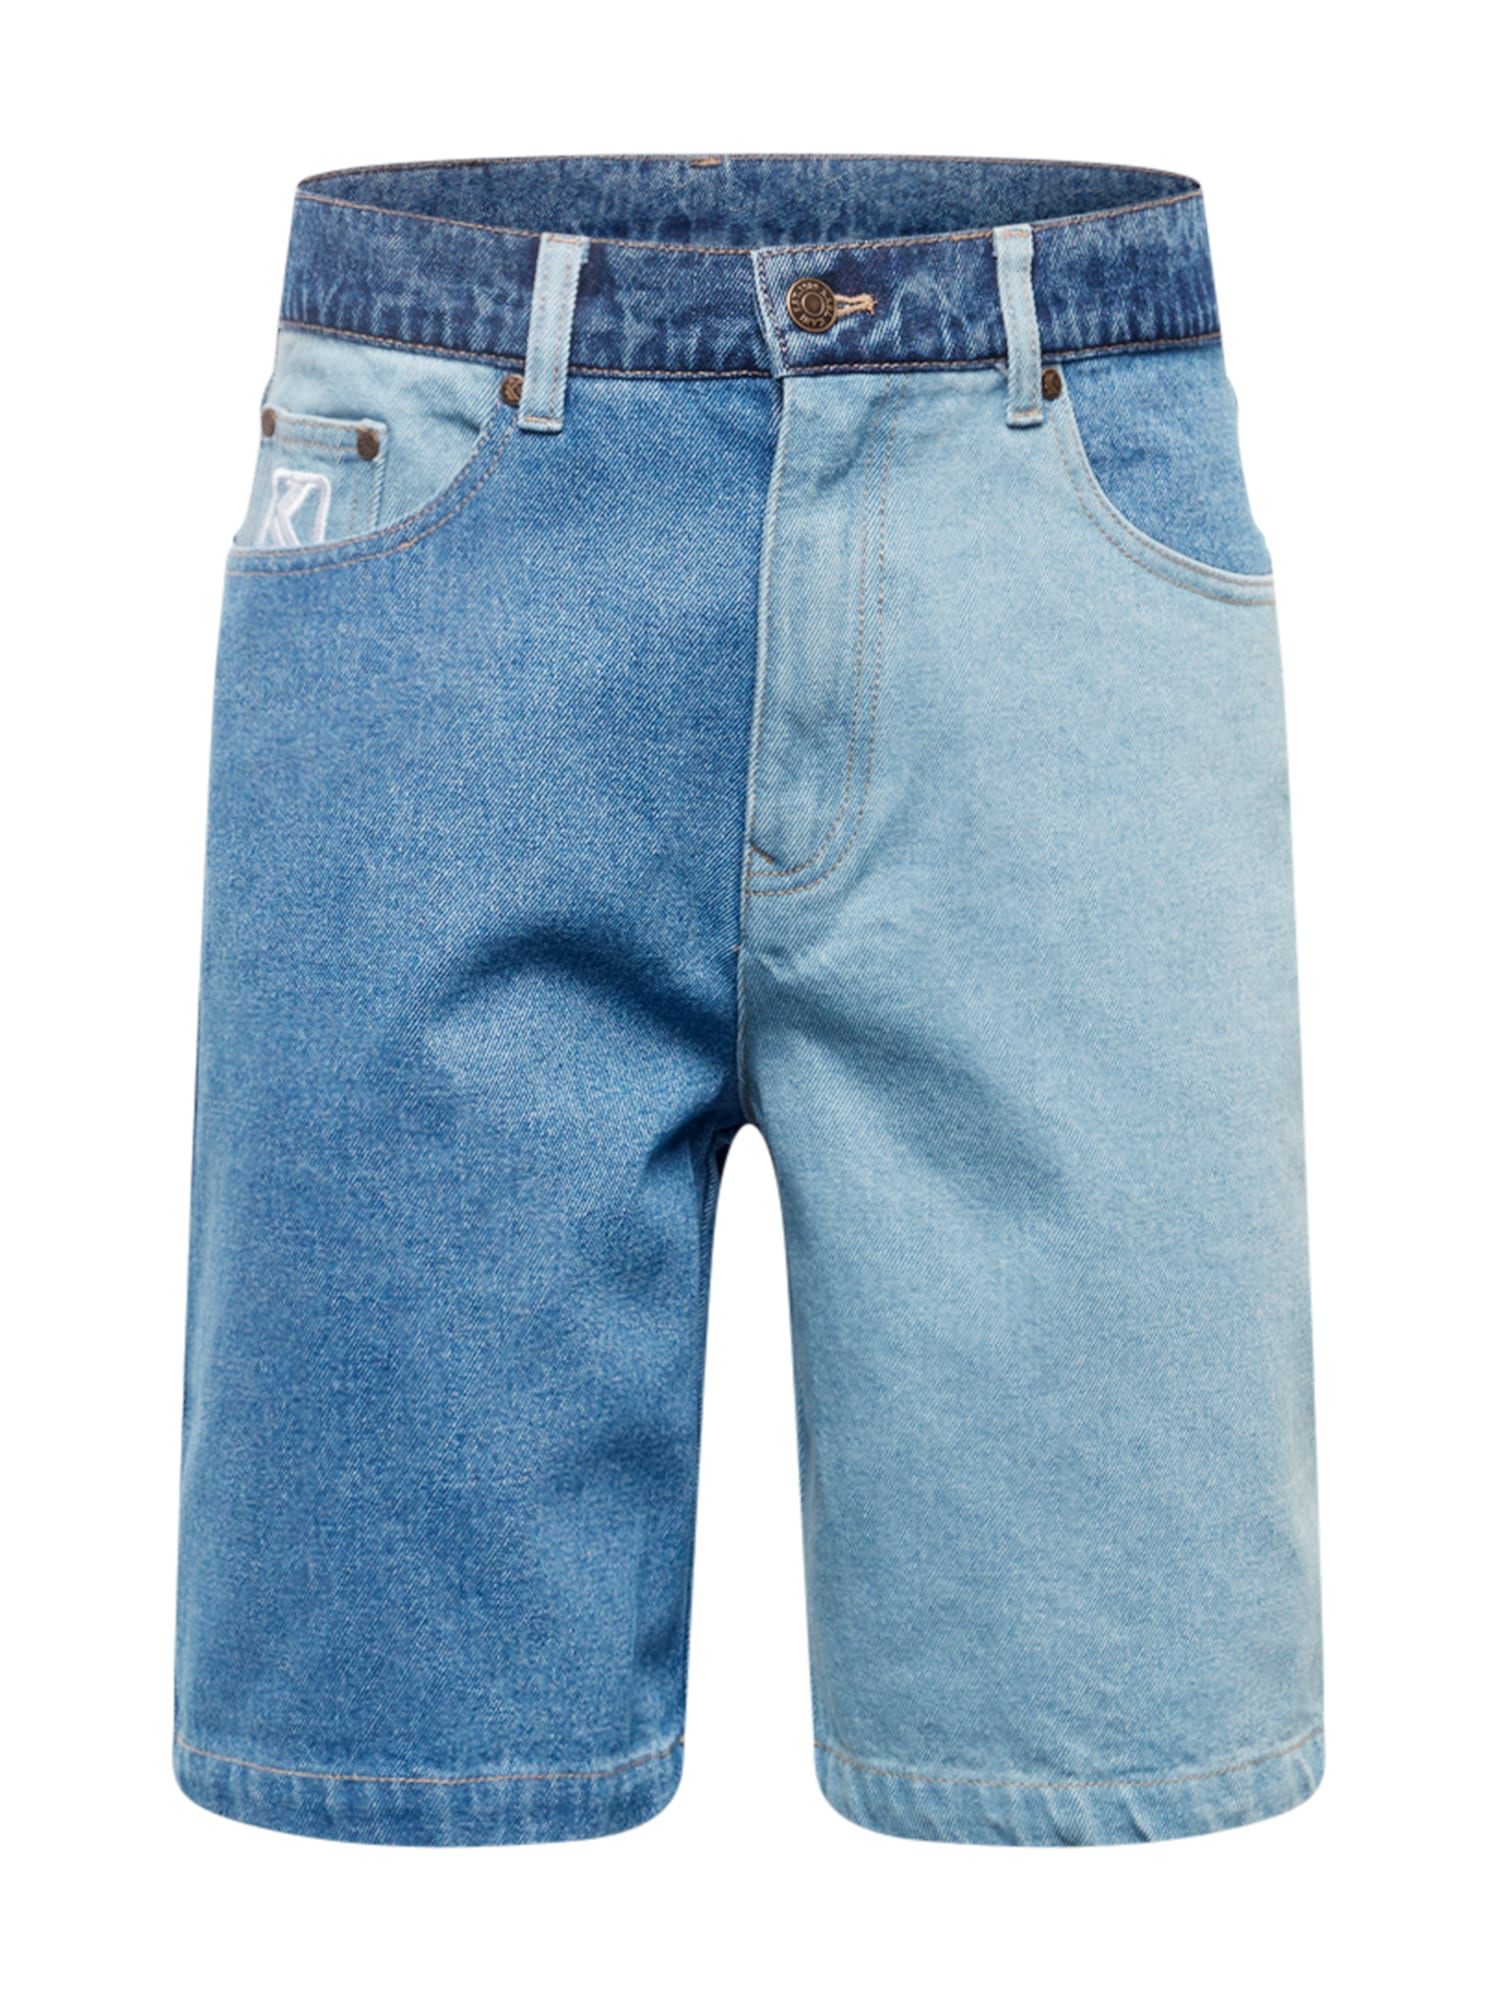 Karl Kani Džinsai tamsiai (džinso) mėlyna / šviesiai mėlyna